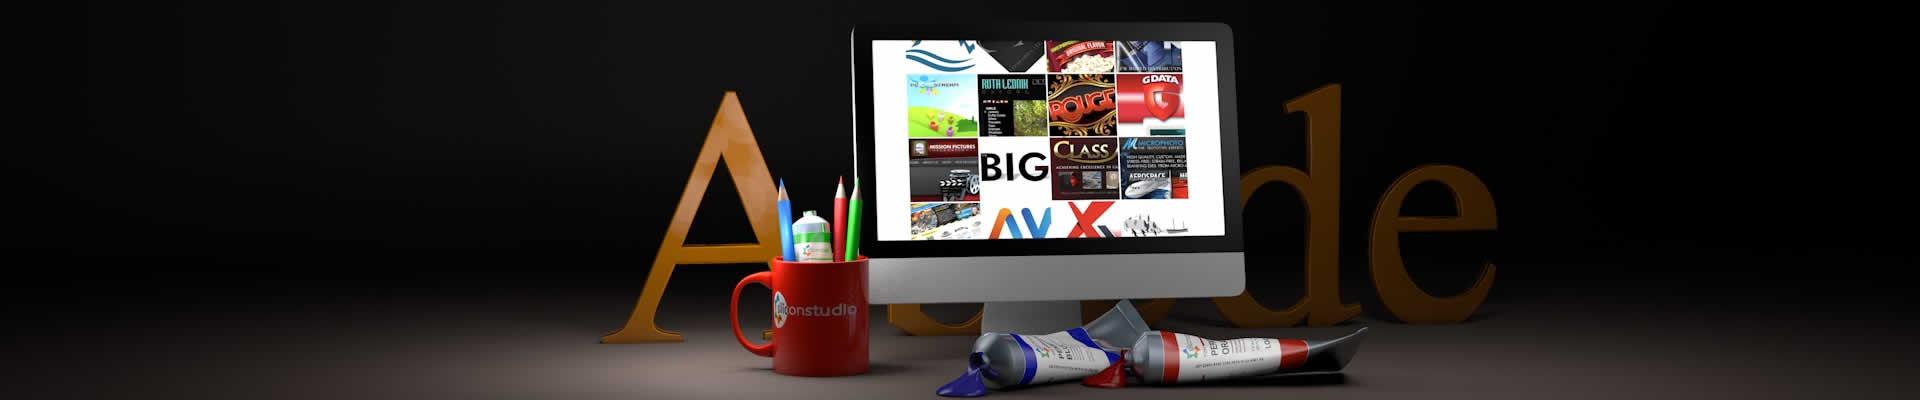 SiliconStudio for Graphic Design